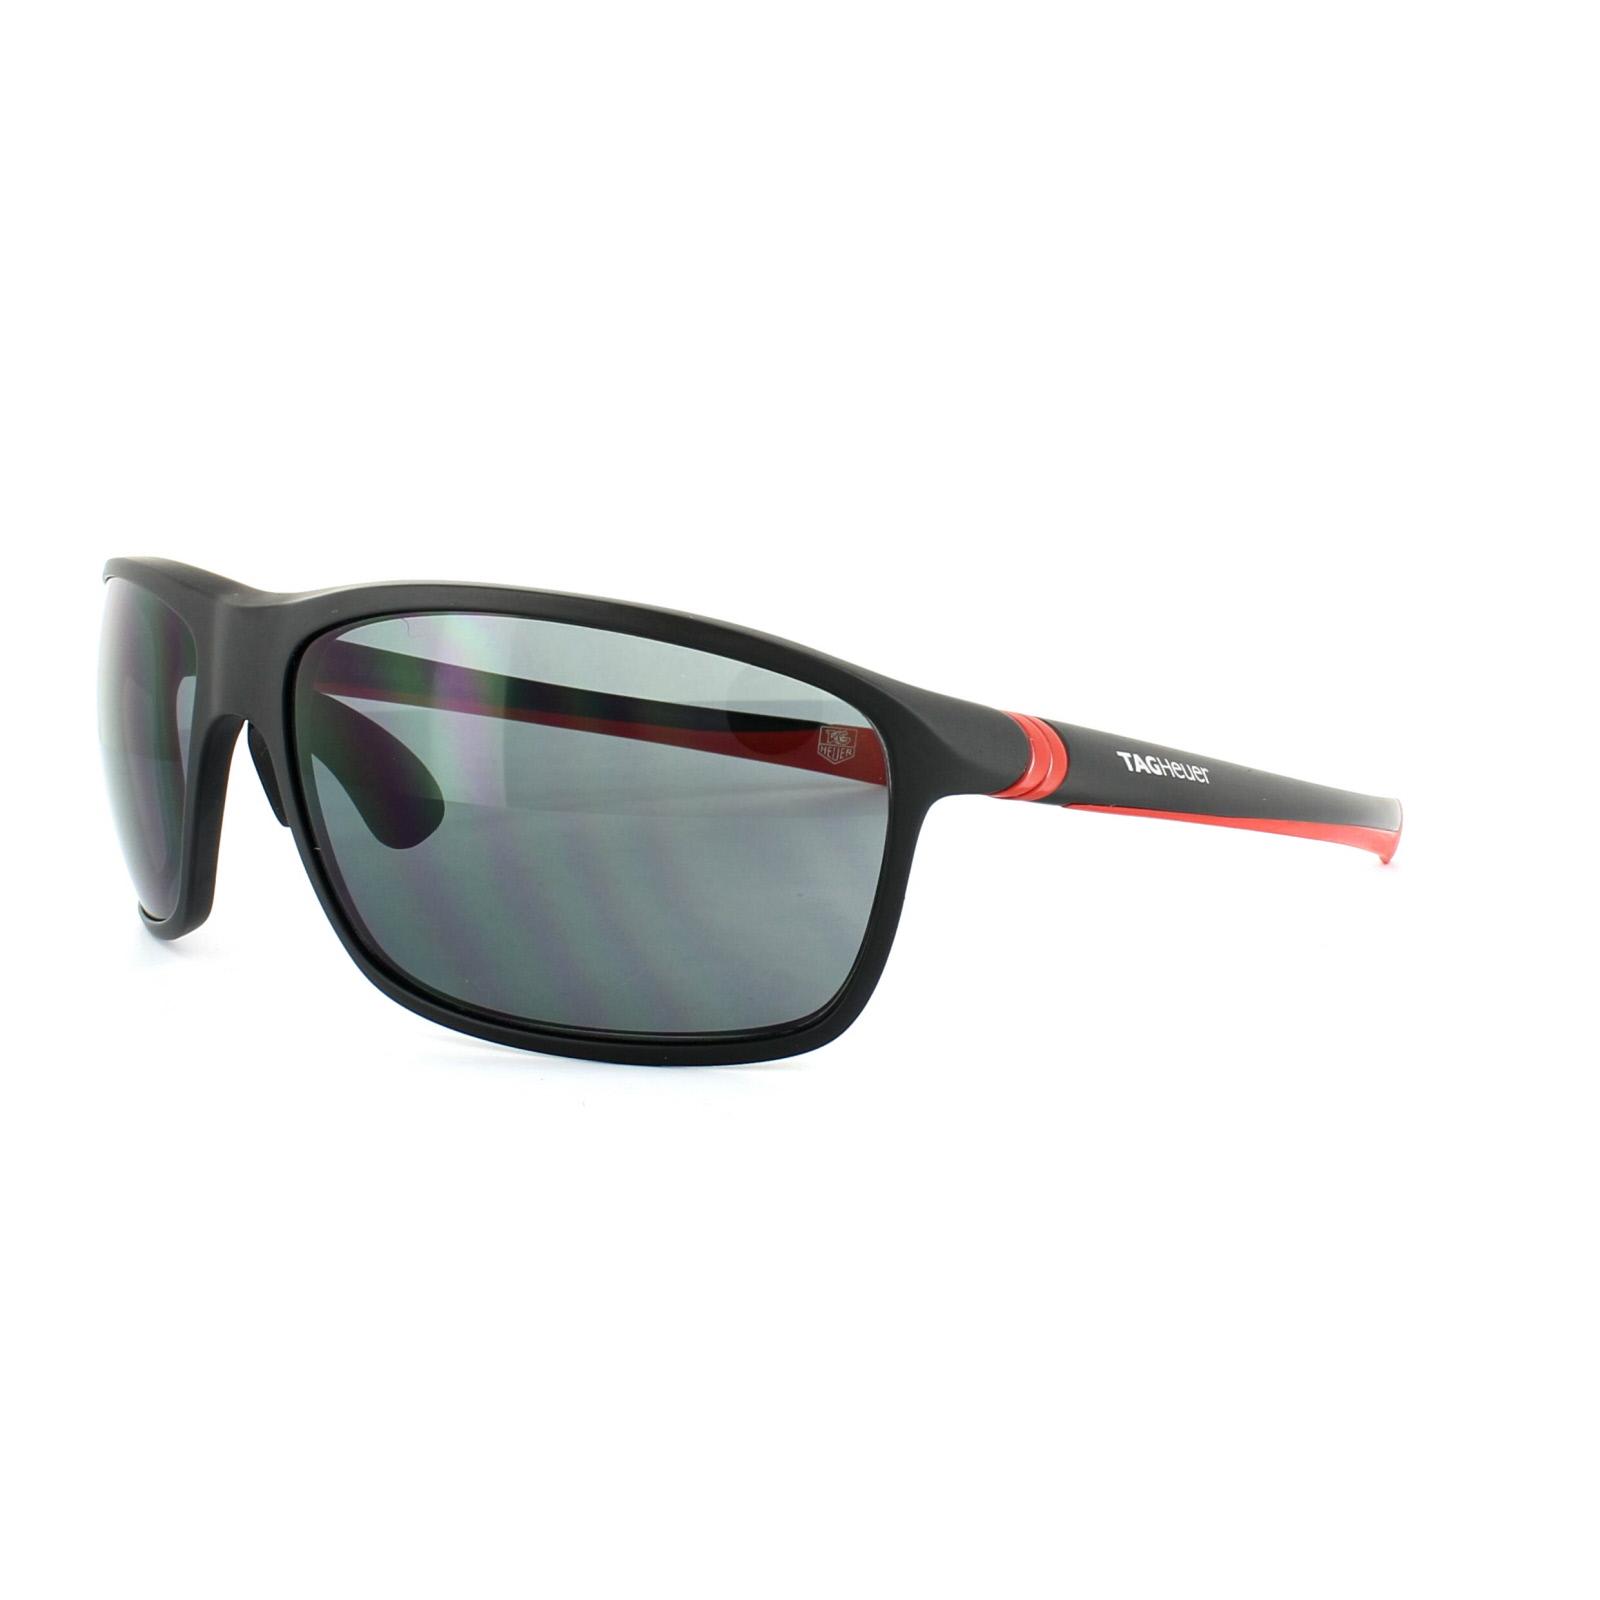 1d67d160e9 Sentinel Tag Heuer Sunglasses 27 Degrees 6023 102 Matt Black Red Grey  Outdoor